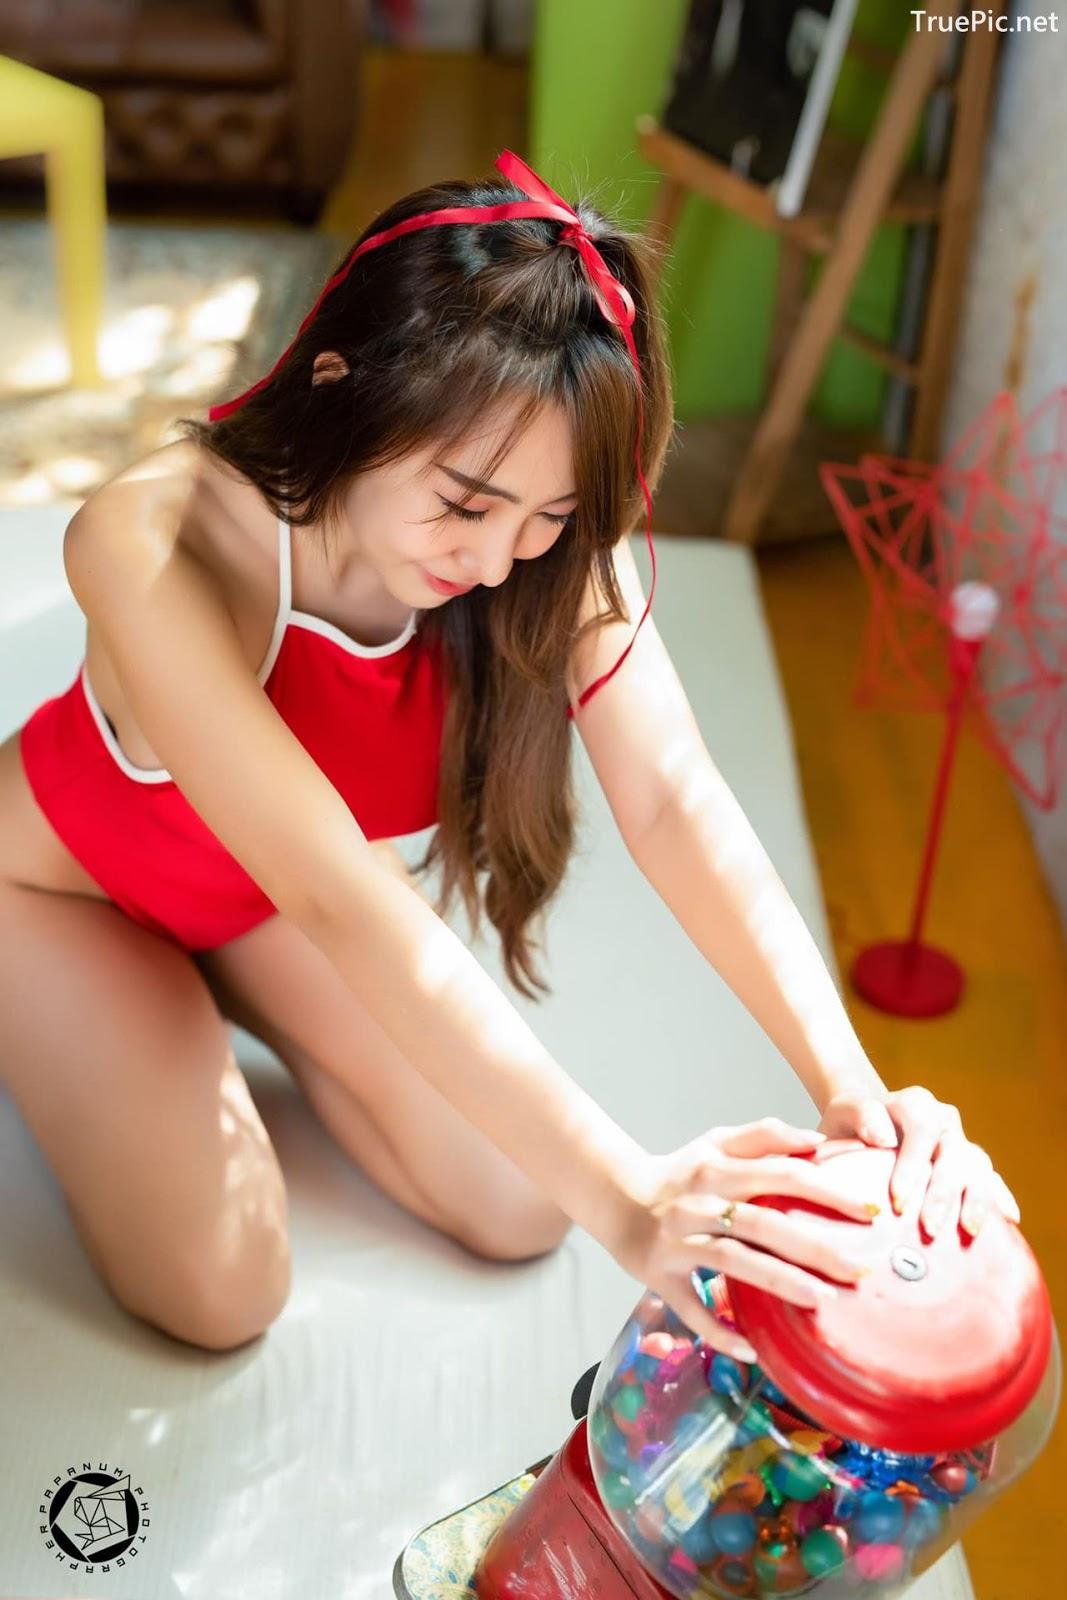 Image-Thailand-Sexy-Model-Suneta-Ngachalvy-Concept-Gloomy-Bear-TruePic.net- Picture-3